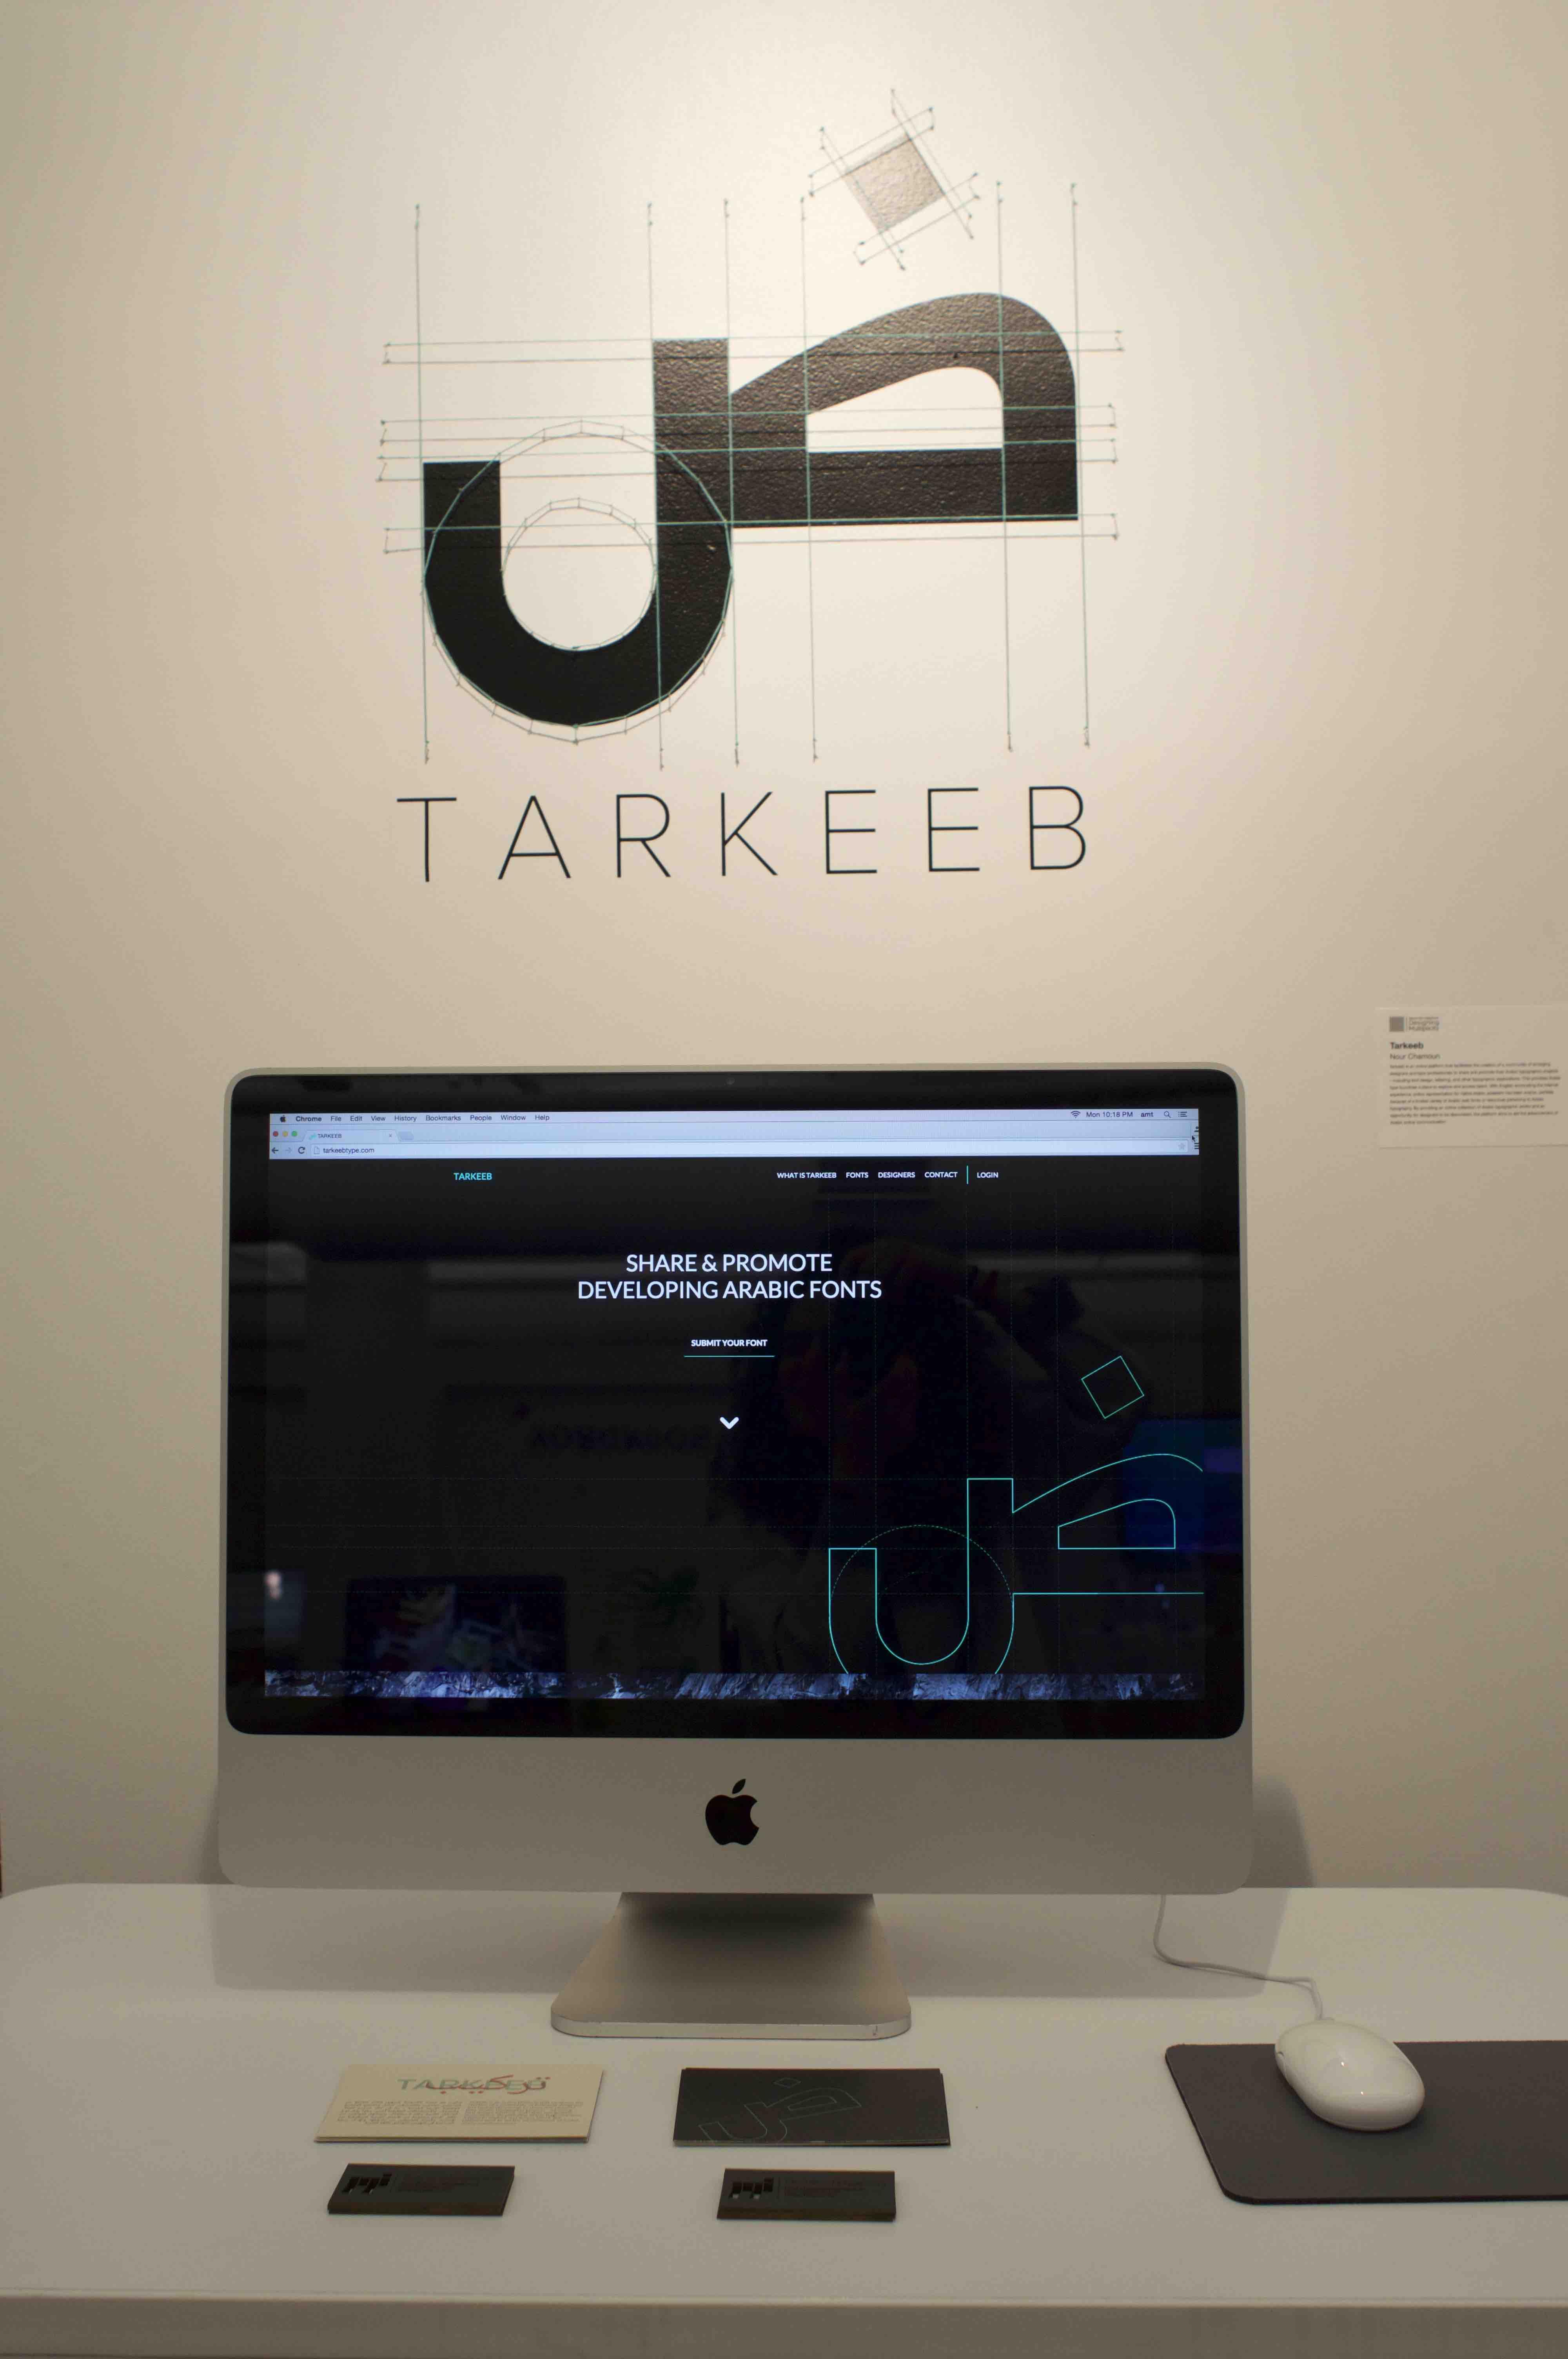 tarkeeb-2